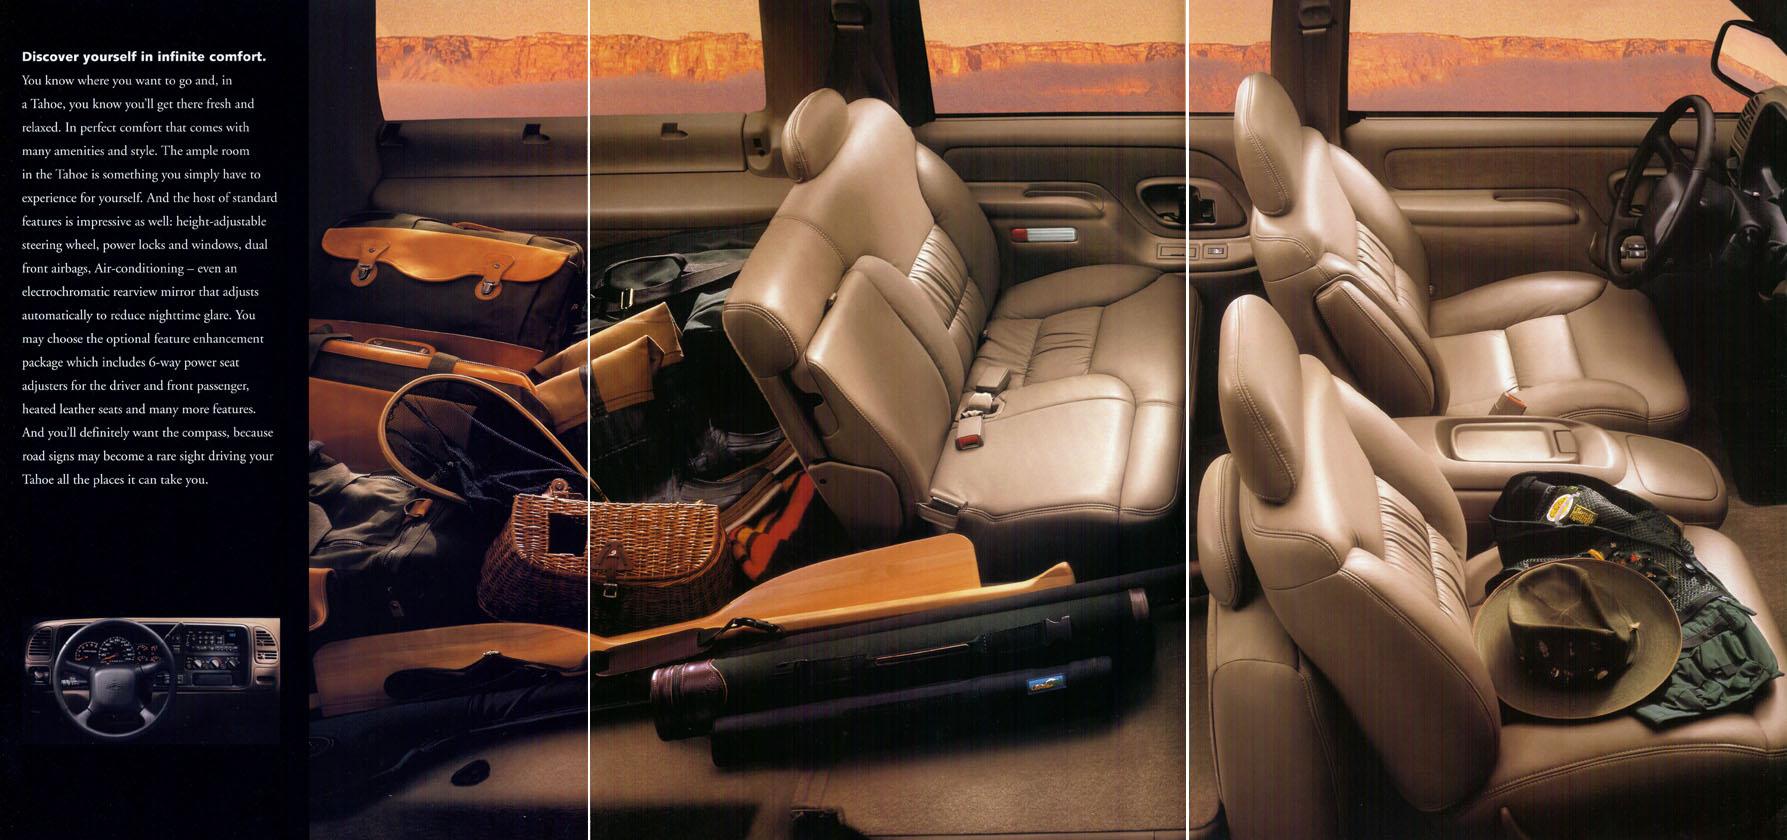 South Pointe Chevrolet Parts >> 1998 Chevy Tahoe/Suburban | Upcomingcarshq.com